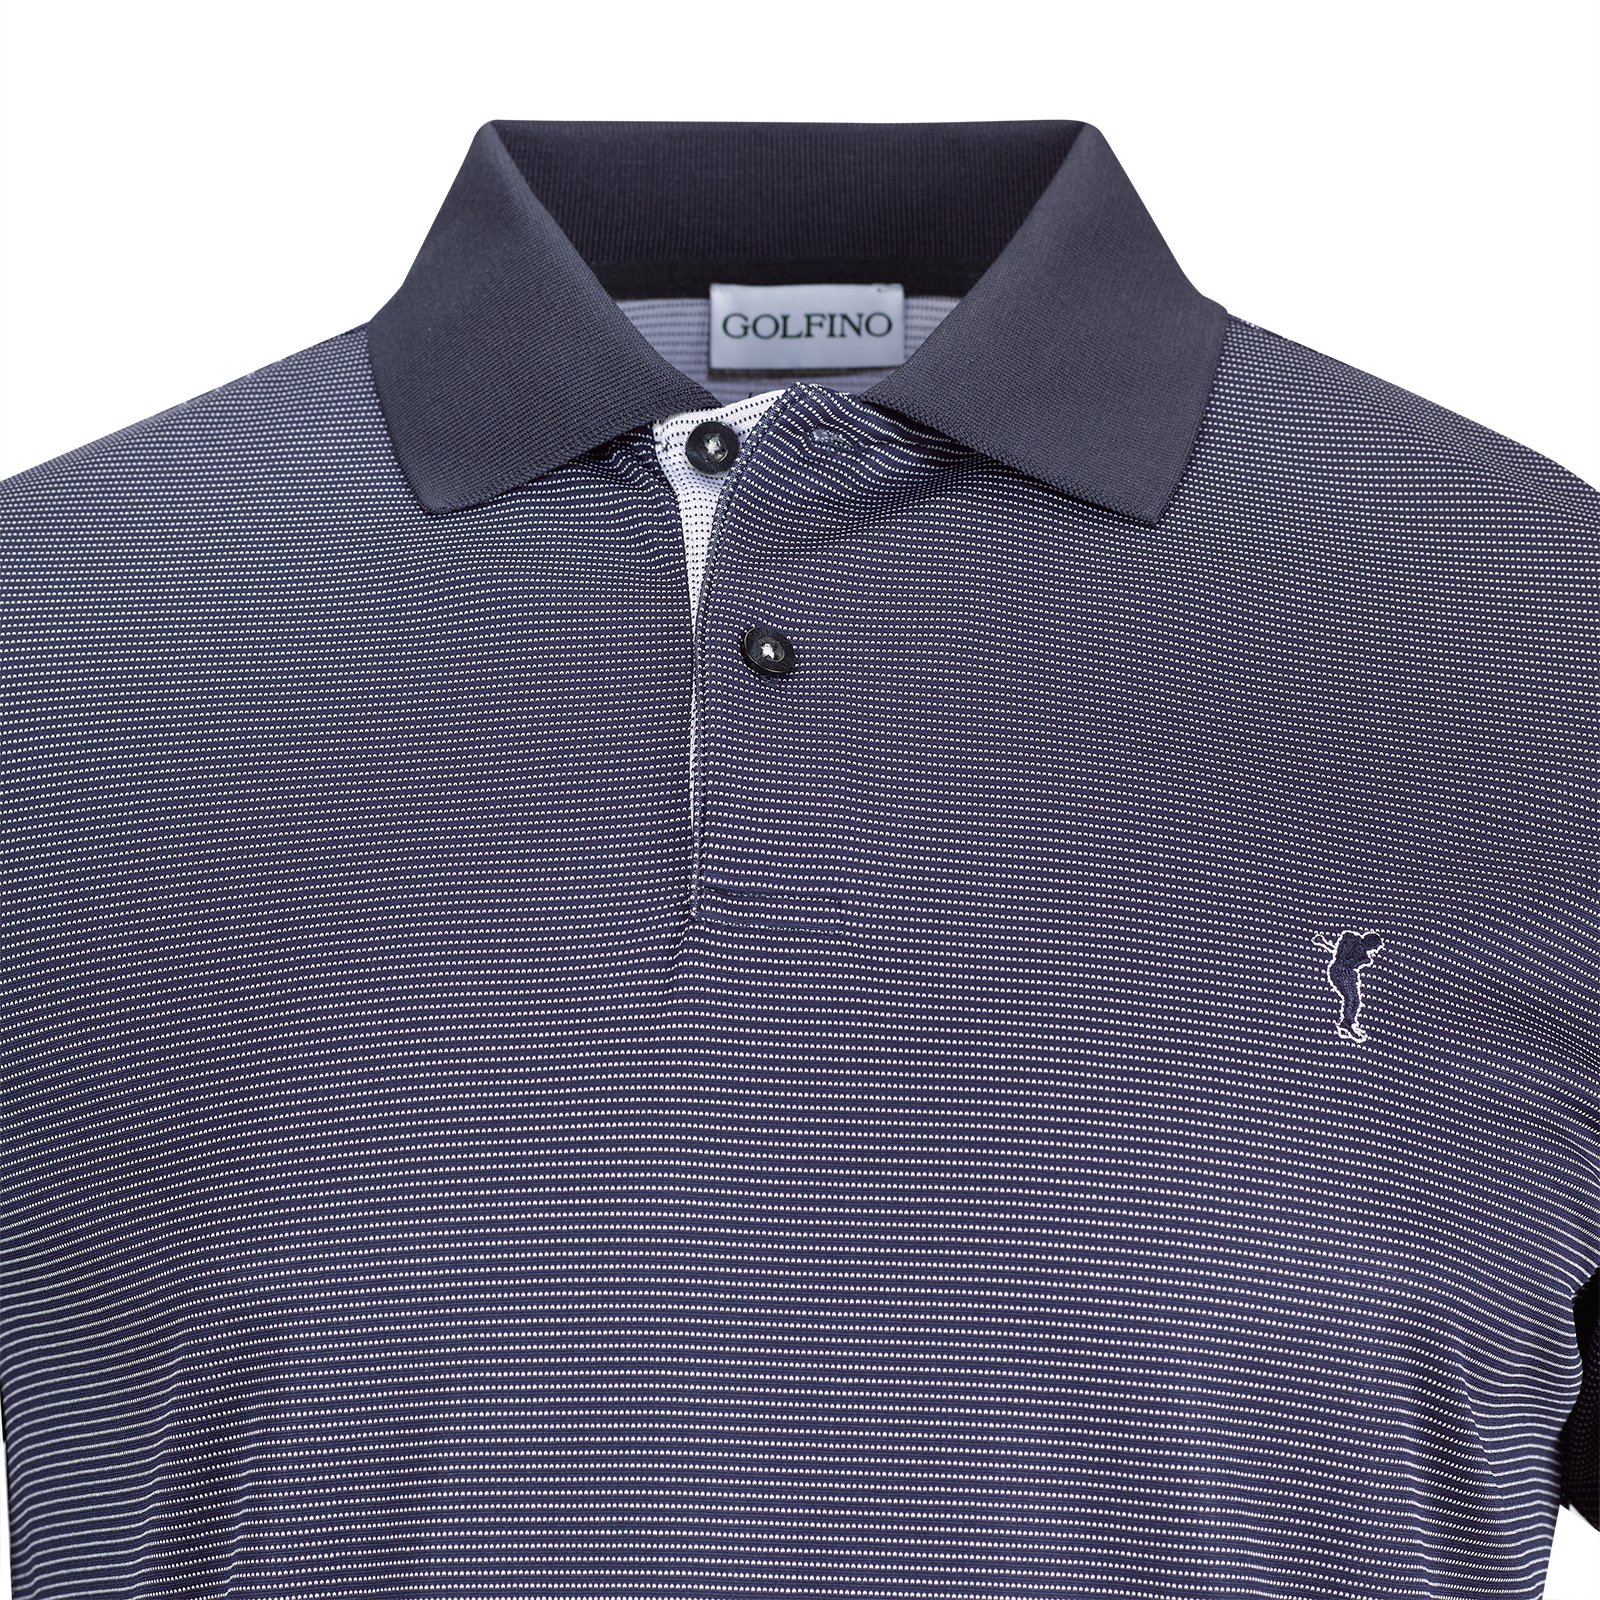 High Performance Herren Kurzarm Golfpolo Quick Dry in Regular Fit